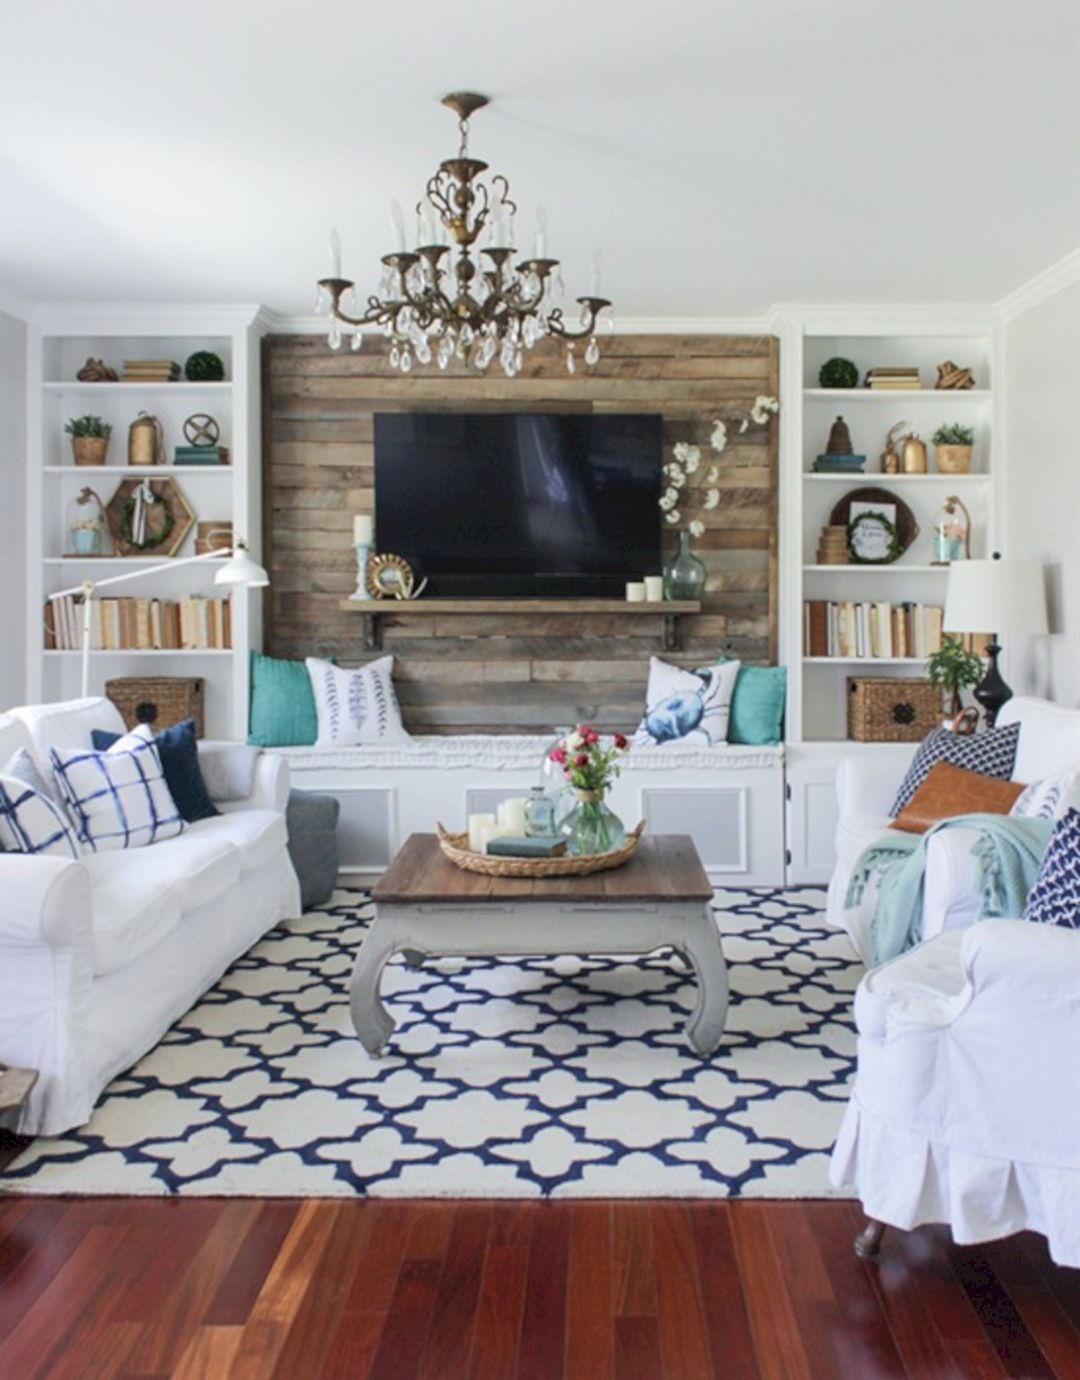 60 most popular focal points ideas to build a beautiful interior rh pinterest com